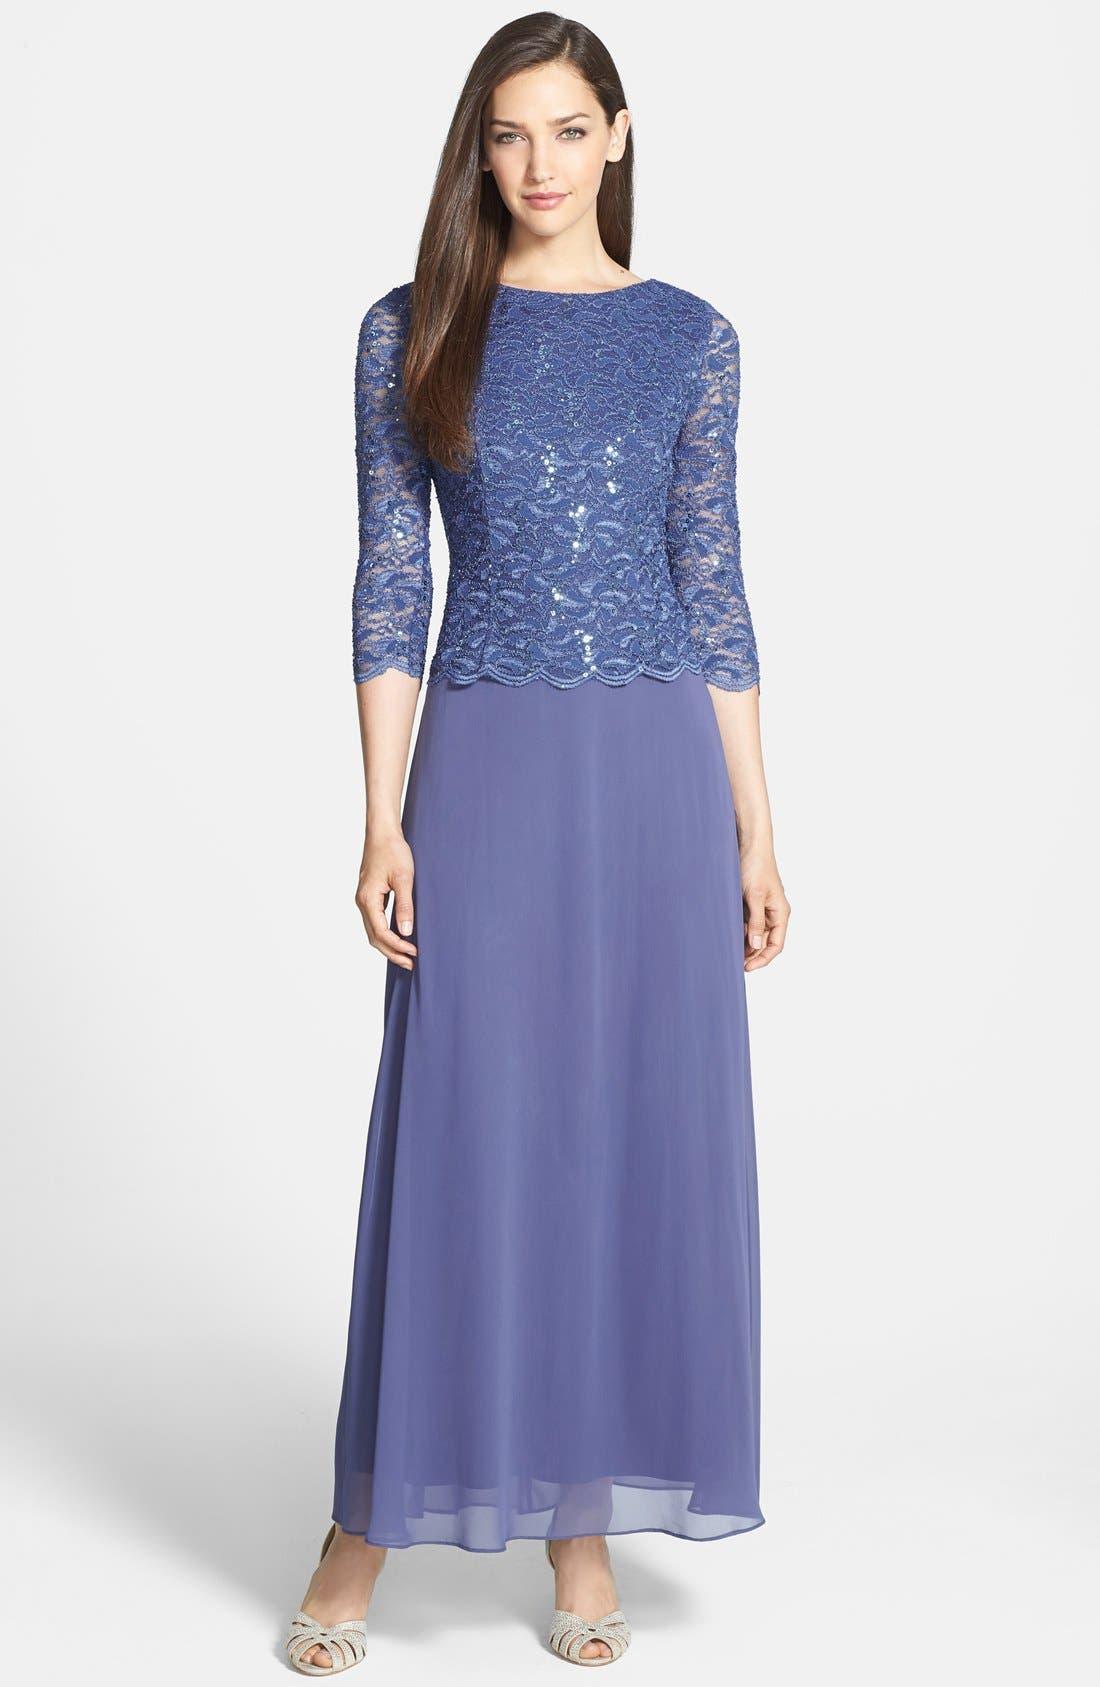 Mother of the Groom Tea Length Dress